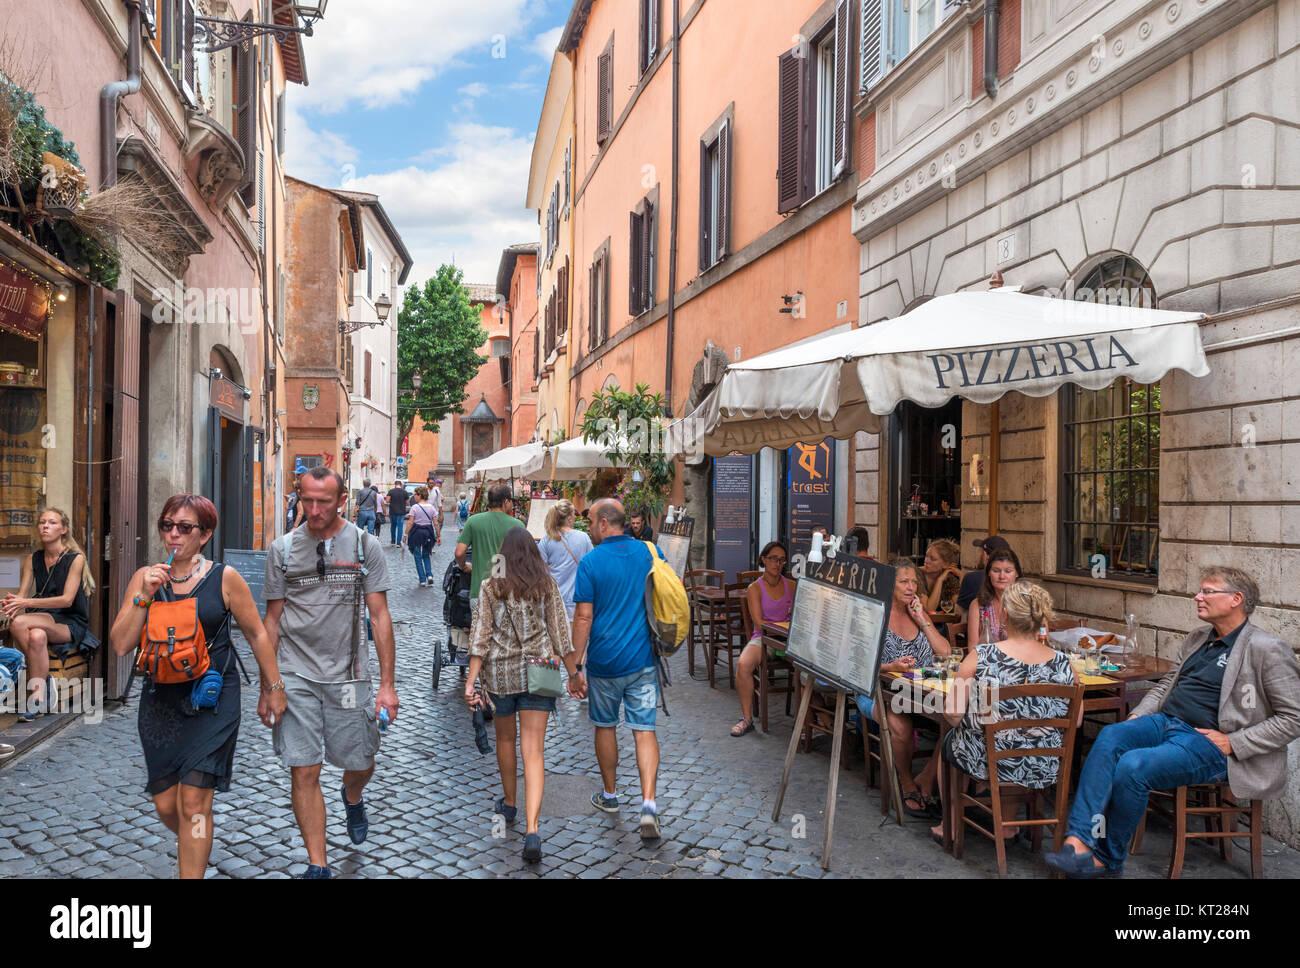 Café-restaurant et dans la Via della Scala, Trastevere, Rome, Italie Photo Stock